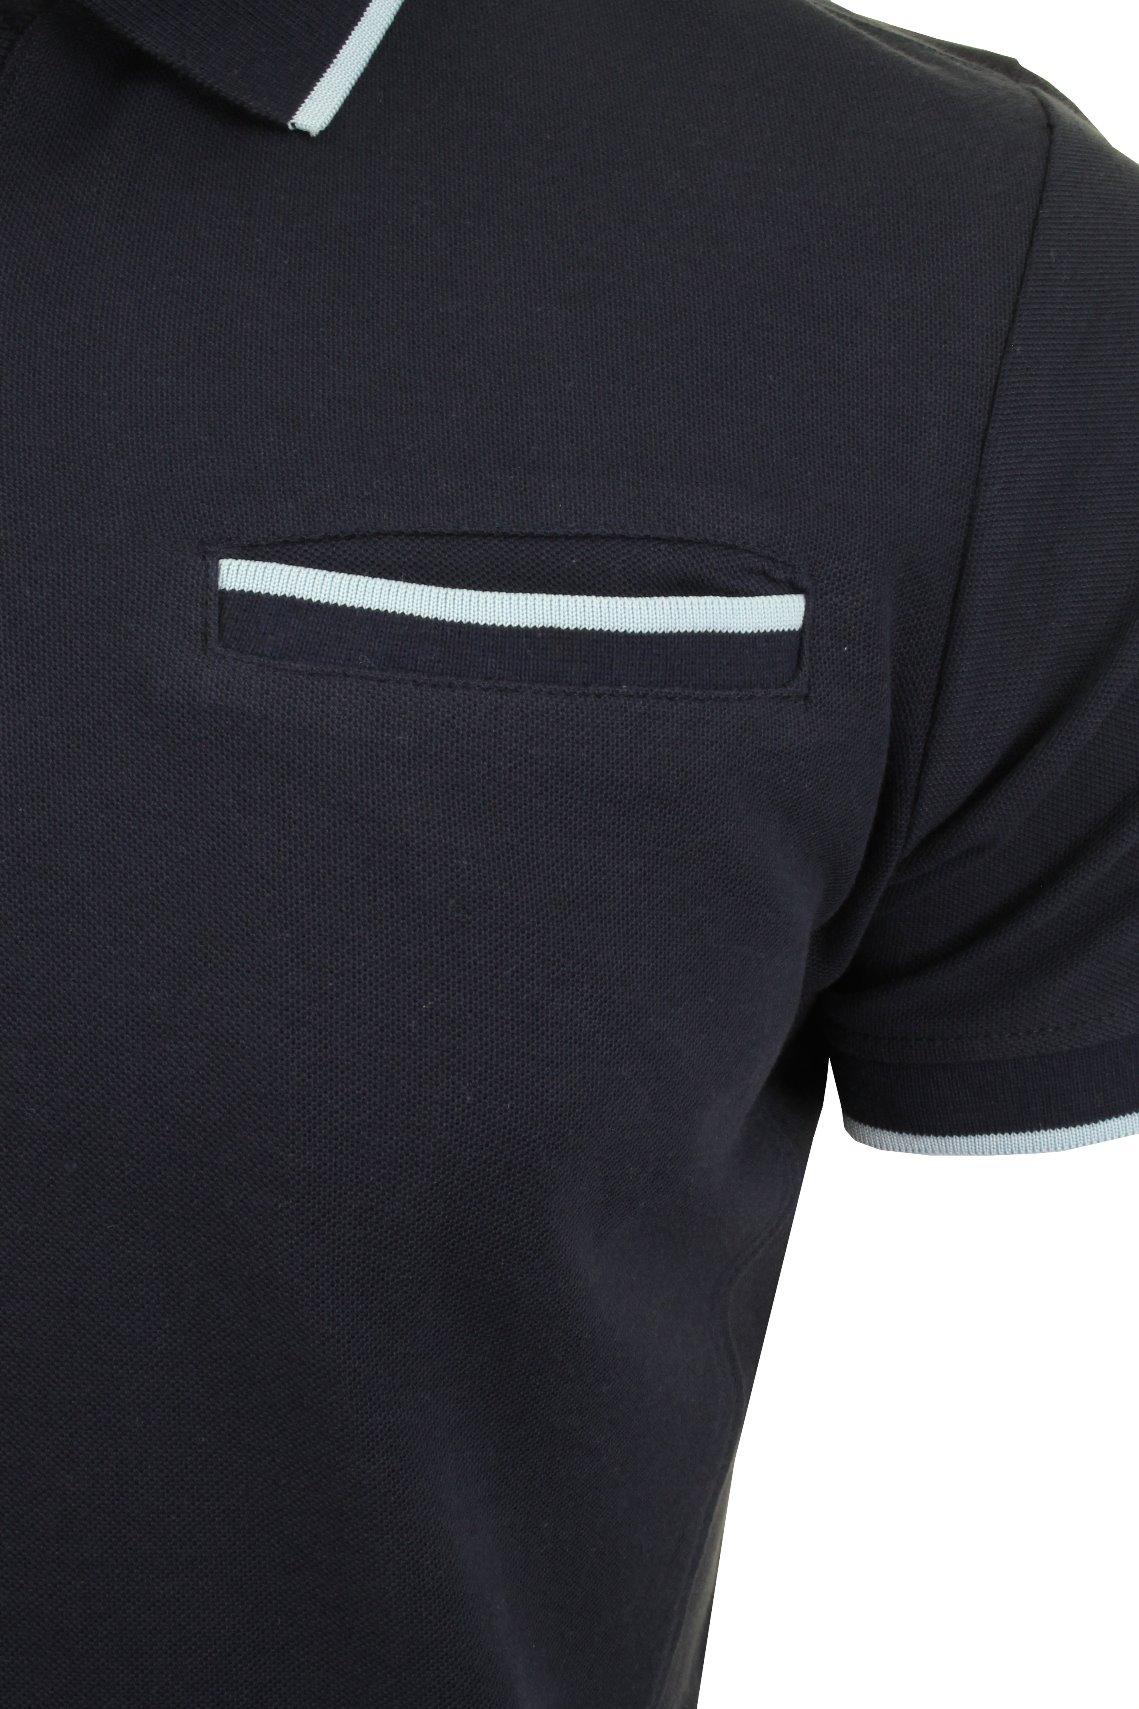 Camisa-Polo-Para-Hombre-Crosshatch-son-sernate-039-Manga-Corta miniatura 7